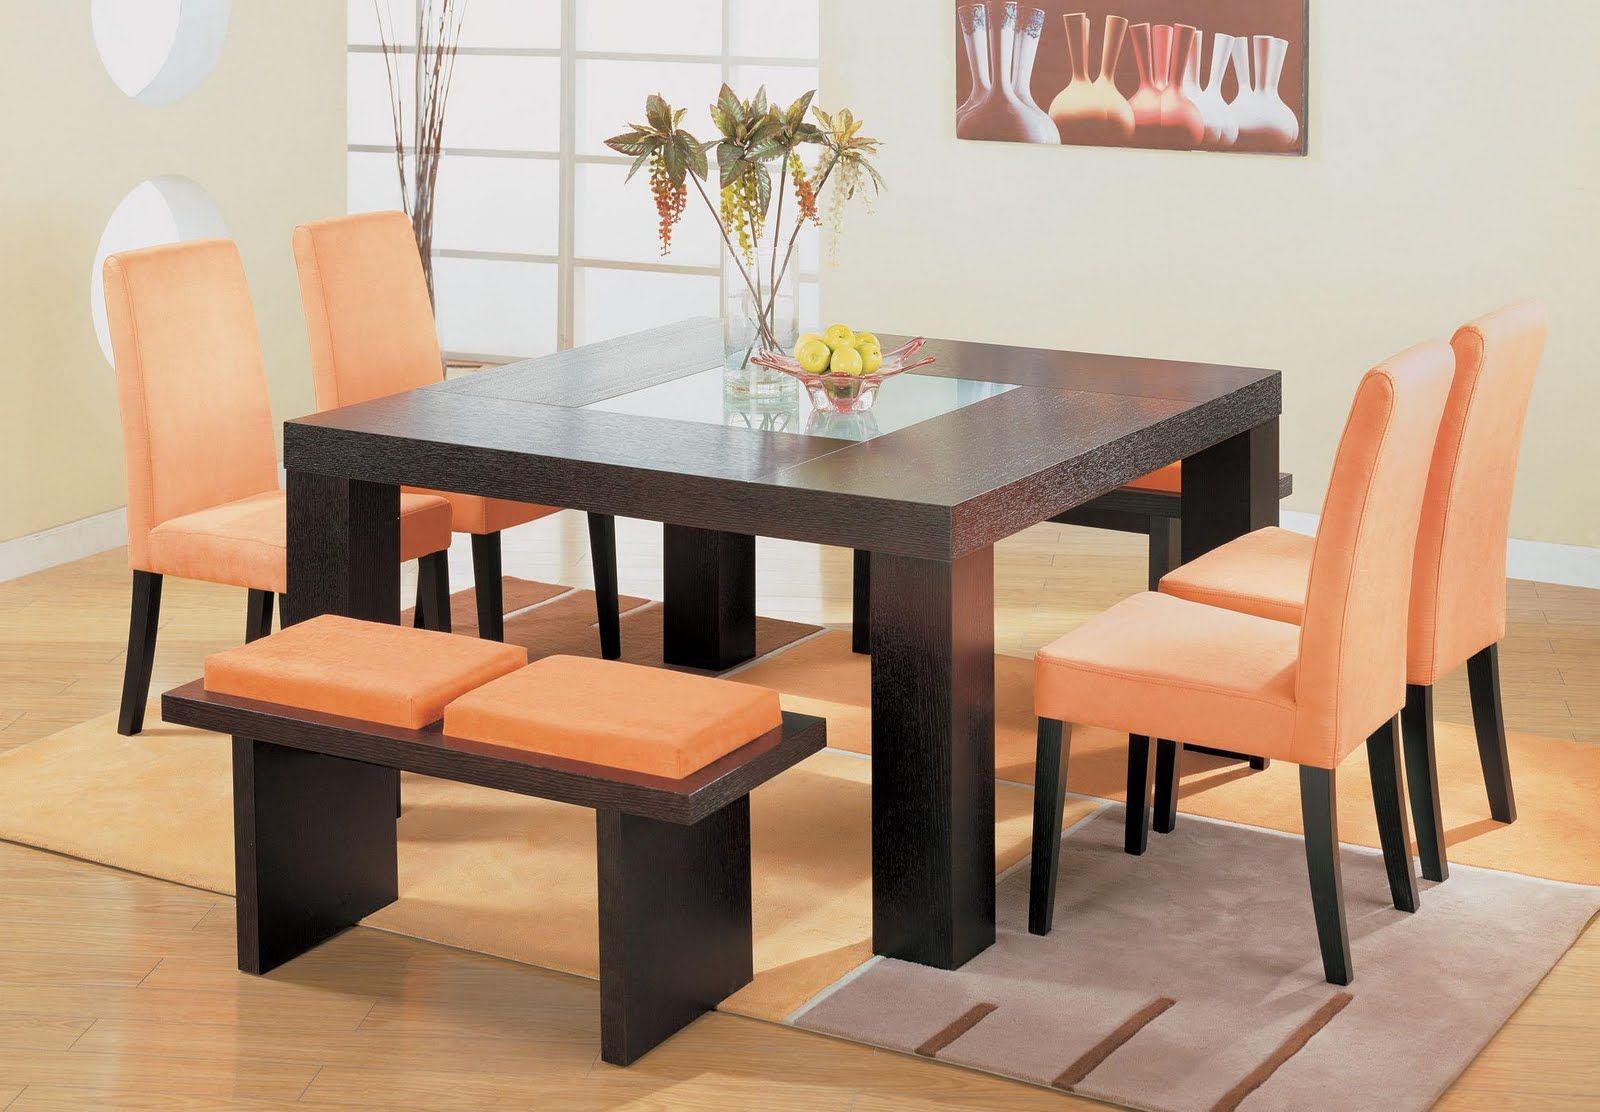 Sillas de madera para comedor modernas best comedor valencia con sillas with sillas de madera - Comedores modernos valencia ...